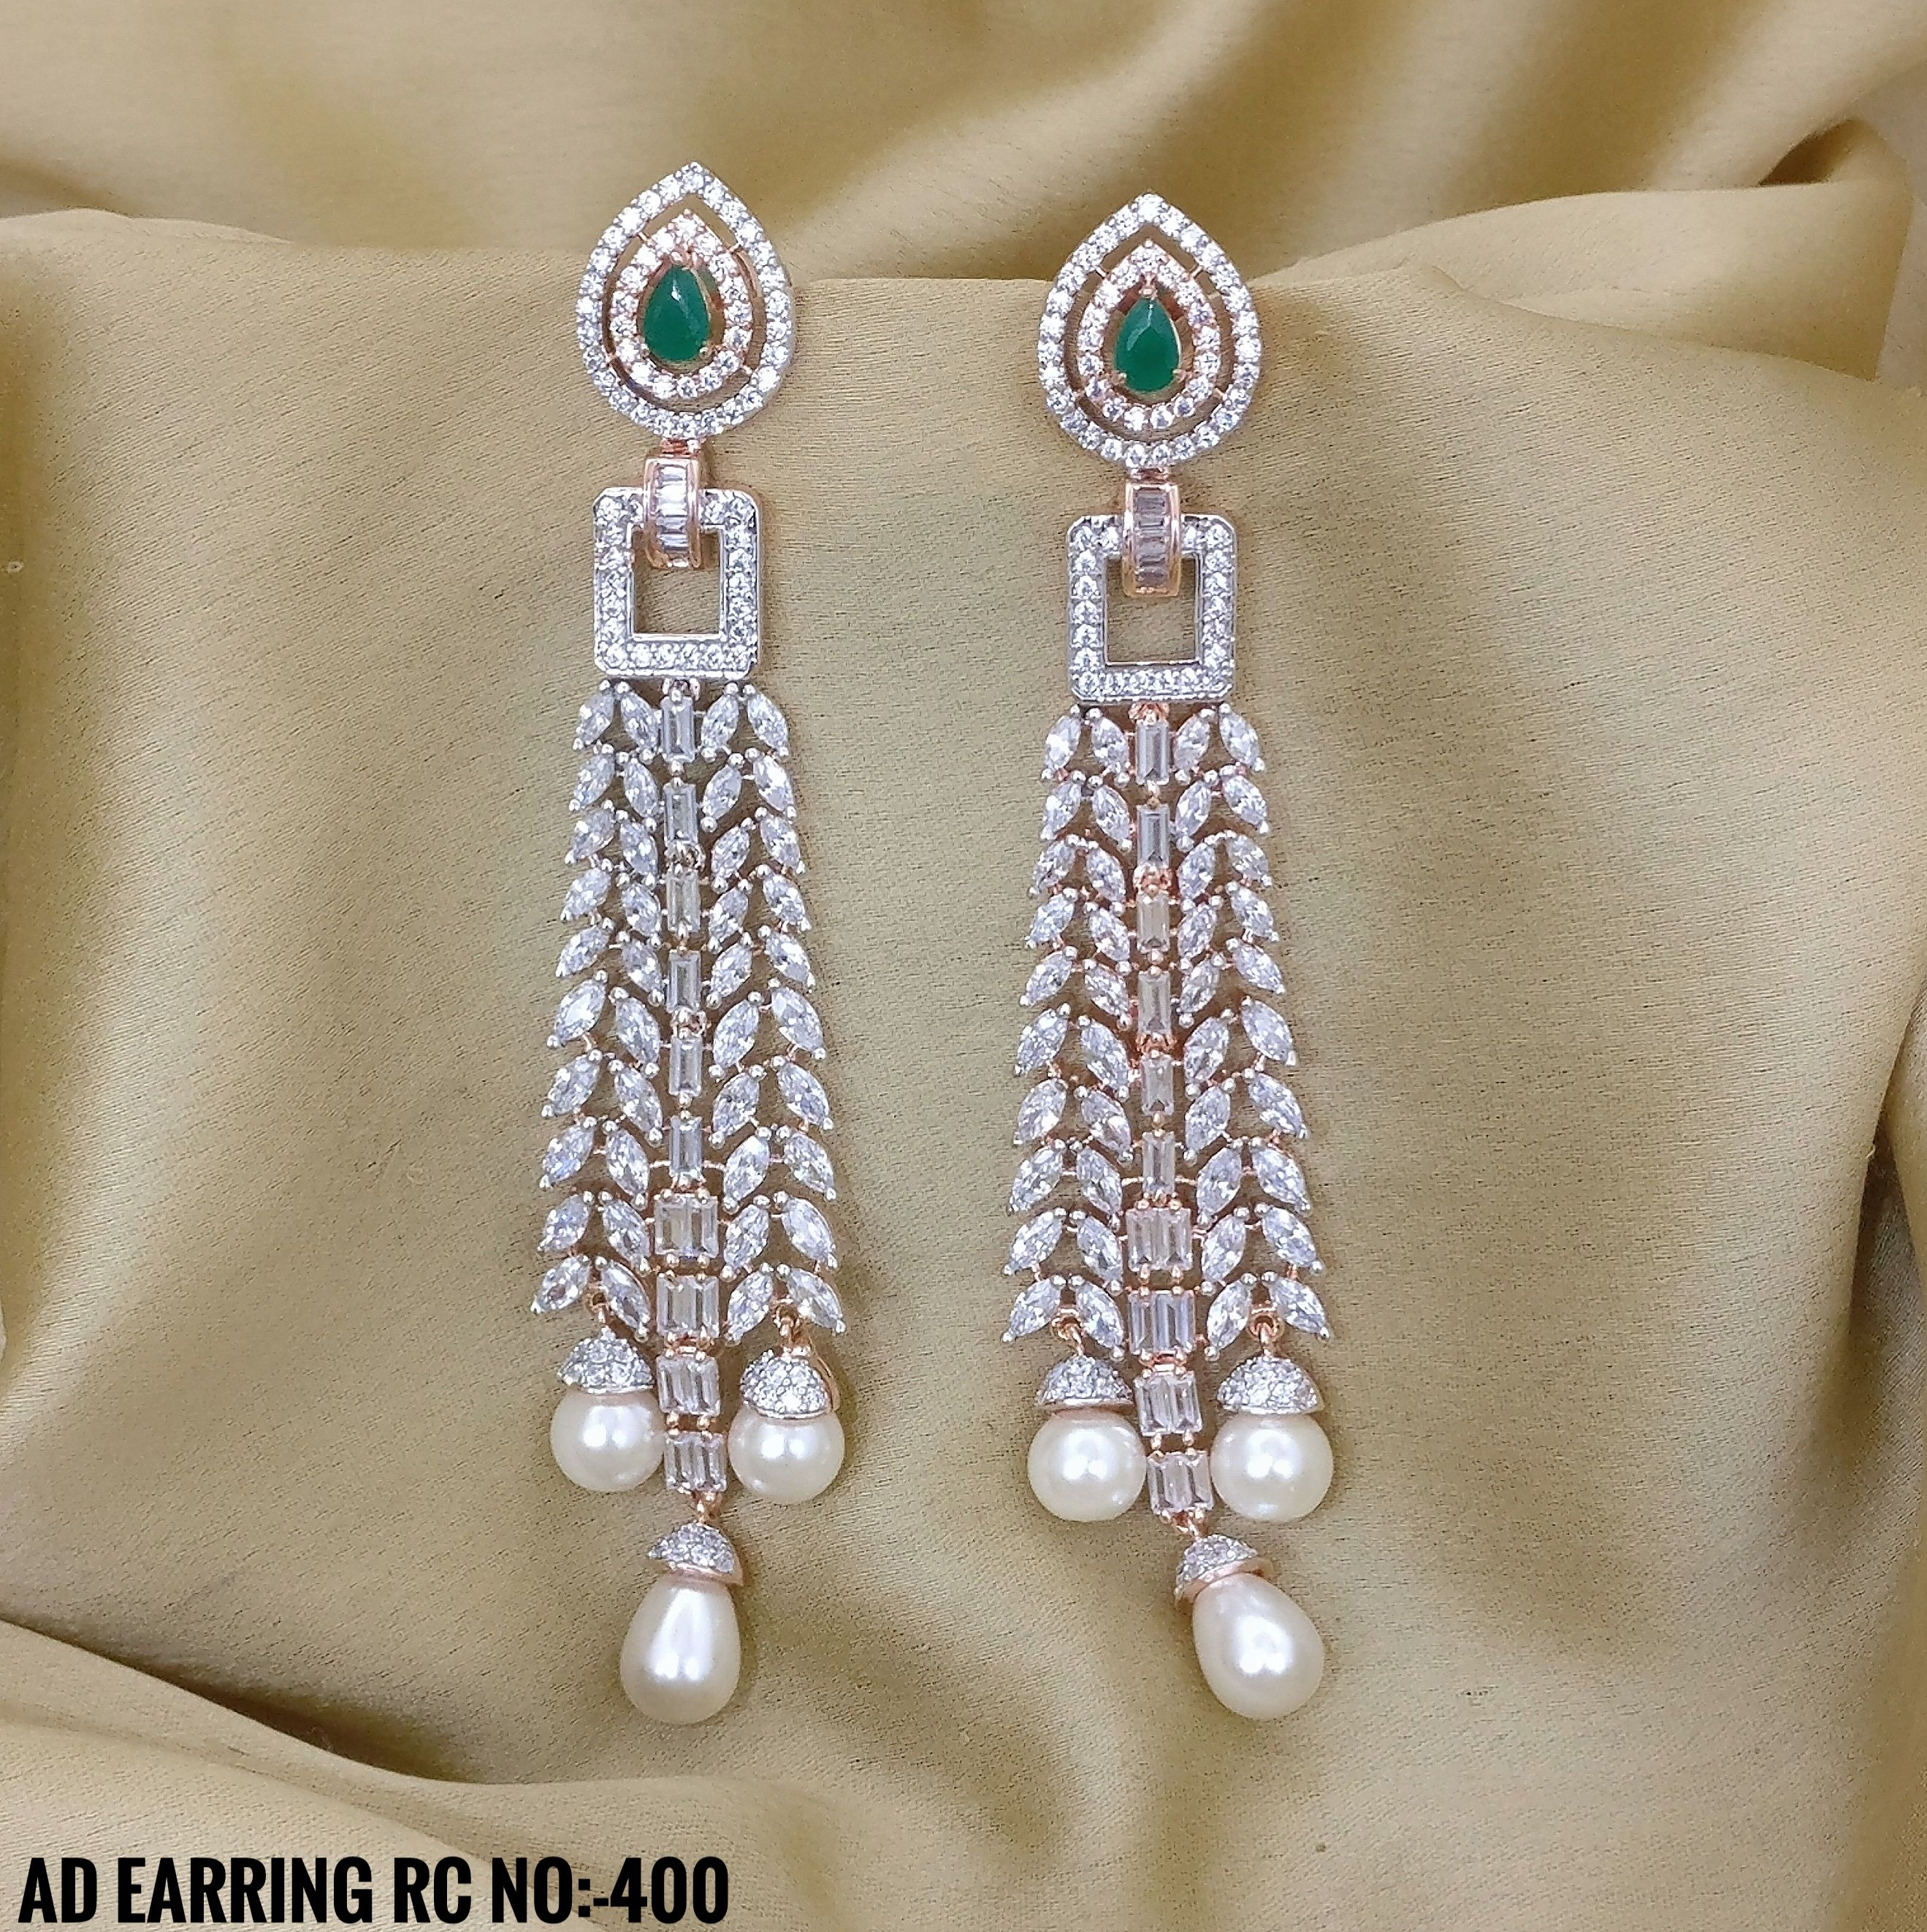 American Diamond Earrings Premium Collection Party Wear Earrings Rama Creations Manufacturer Wholesalers Of Artifi American Diamond Jewelry Fashion Jewelry